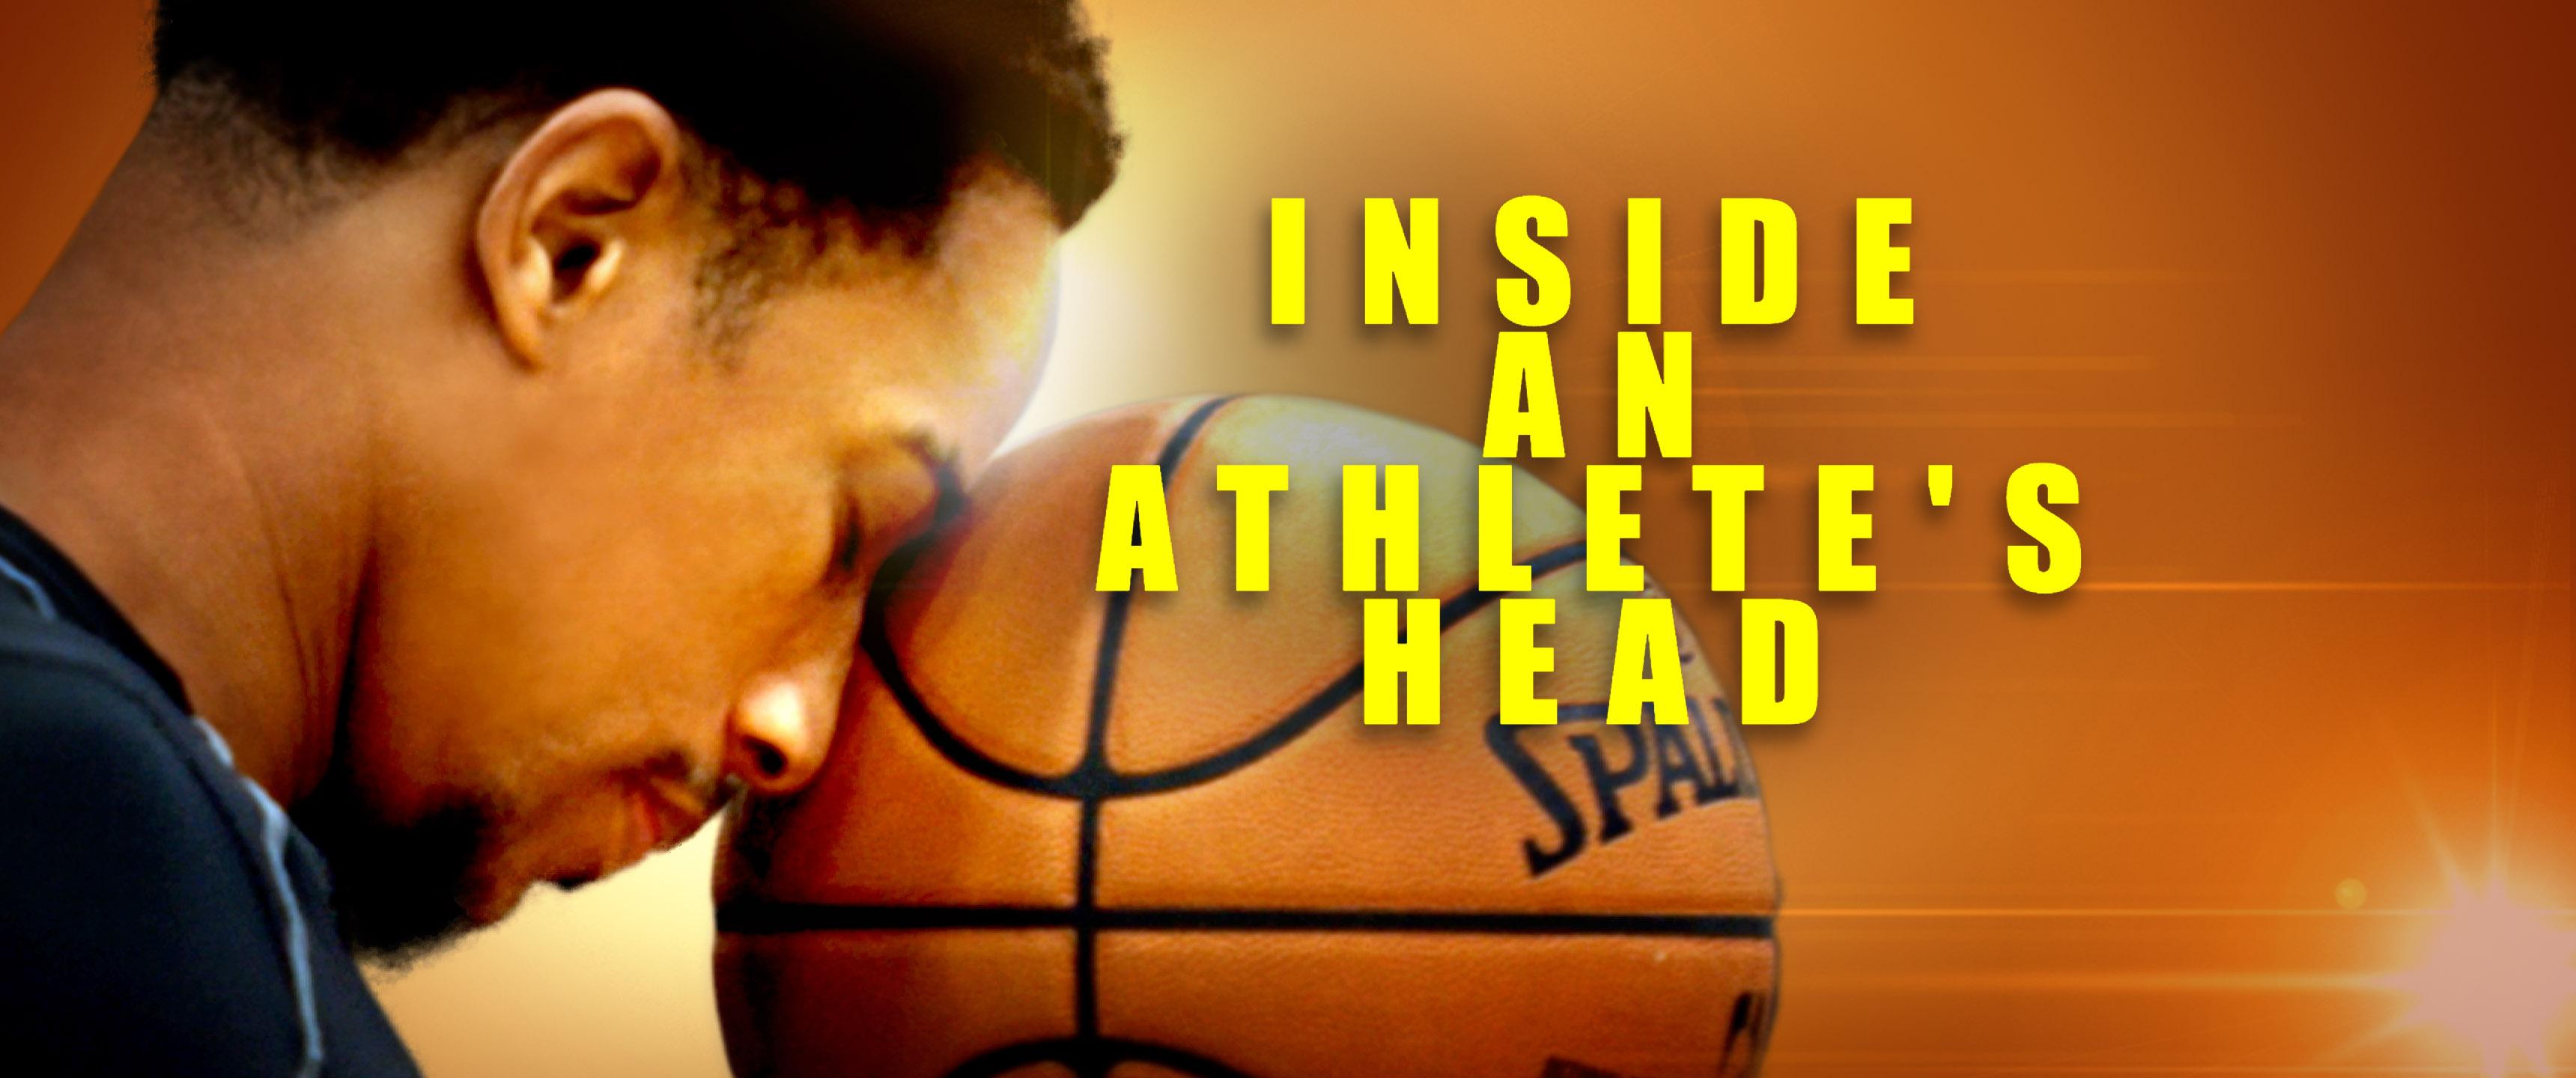 Inside an Athlete's Head